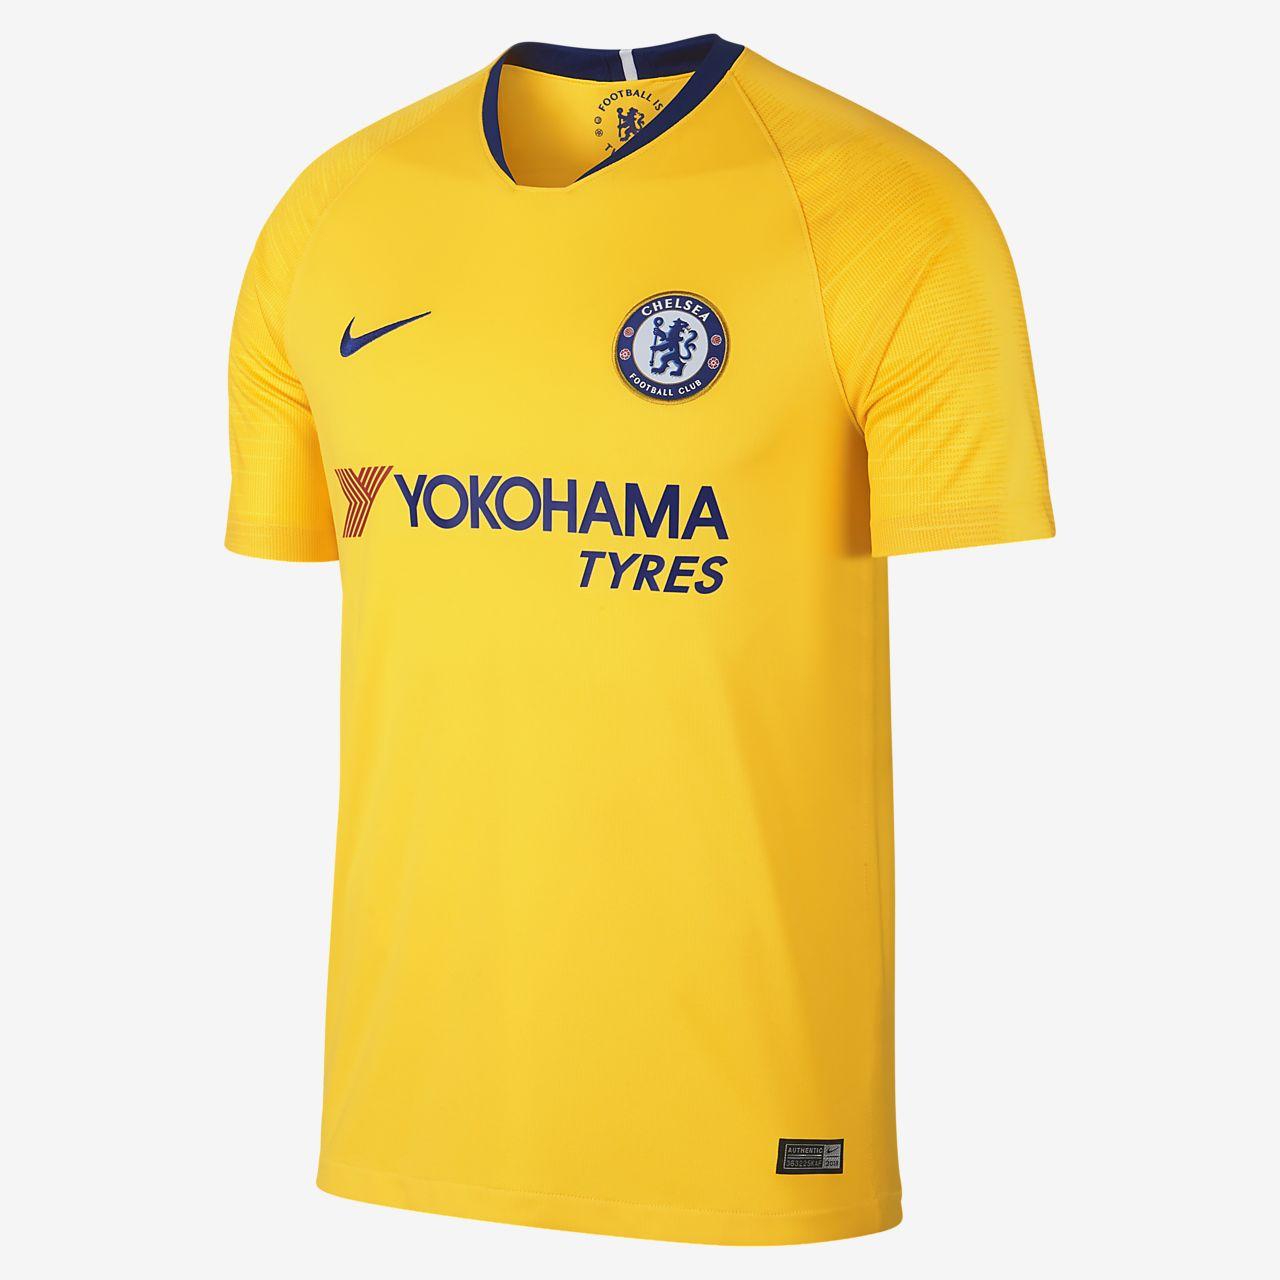 Camiseta de fútbol para hombre 2018 19 Chelsea FC Stadium Away. Nike ... 54f11fda713a1